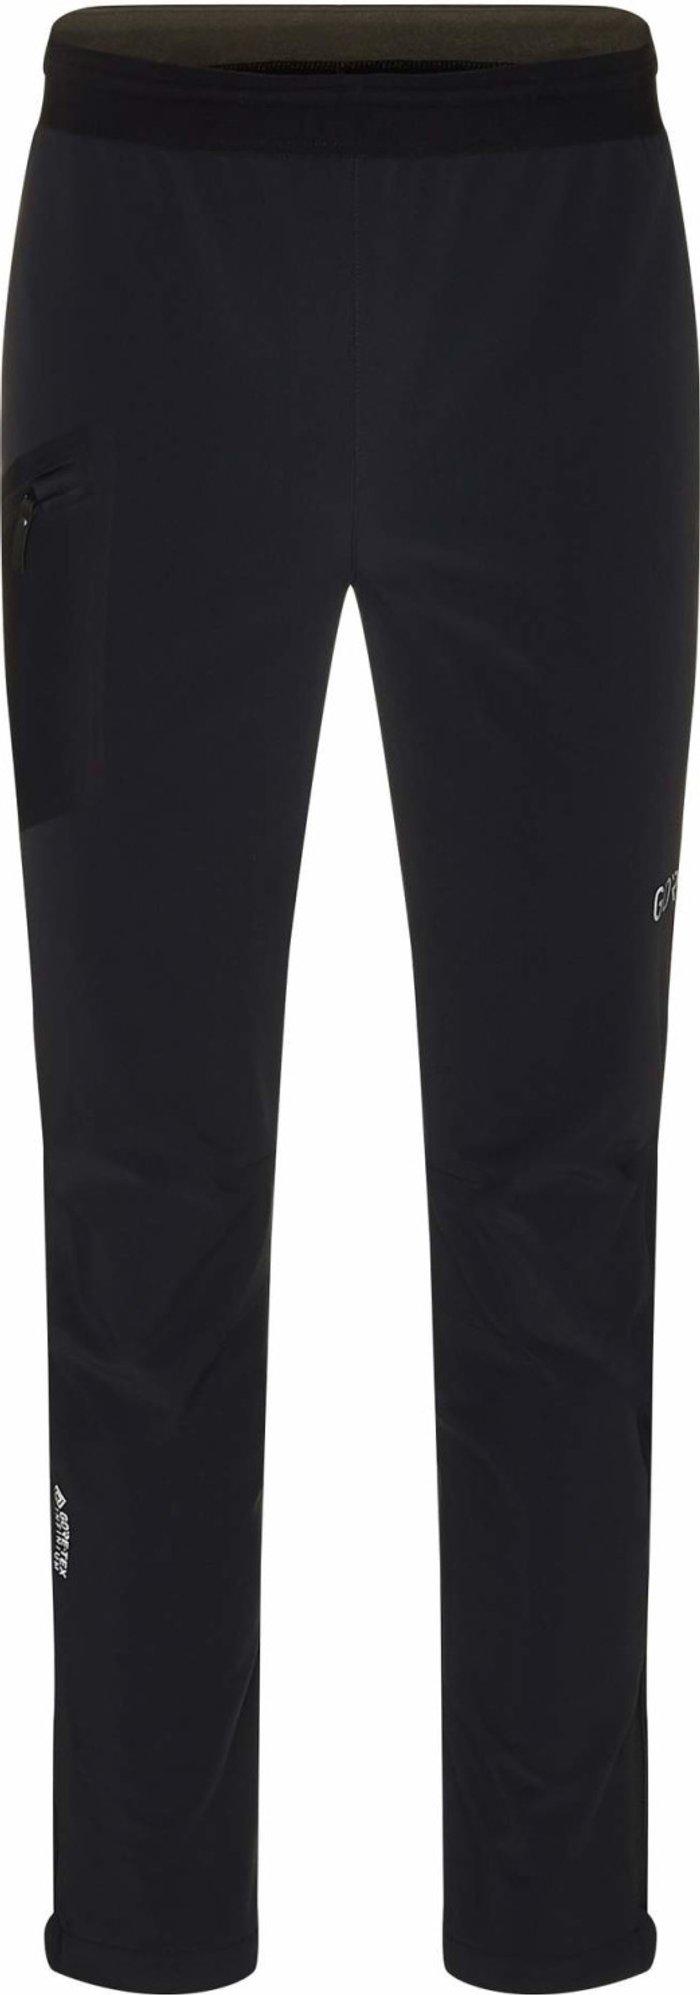 GORE Gore X7 Partial GTX I Pants black